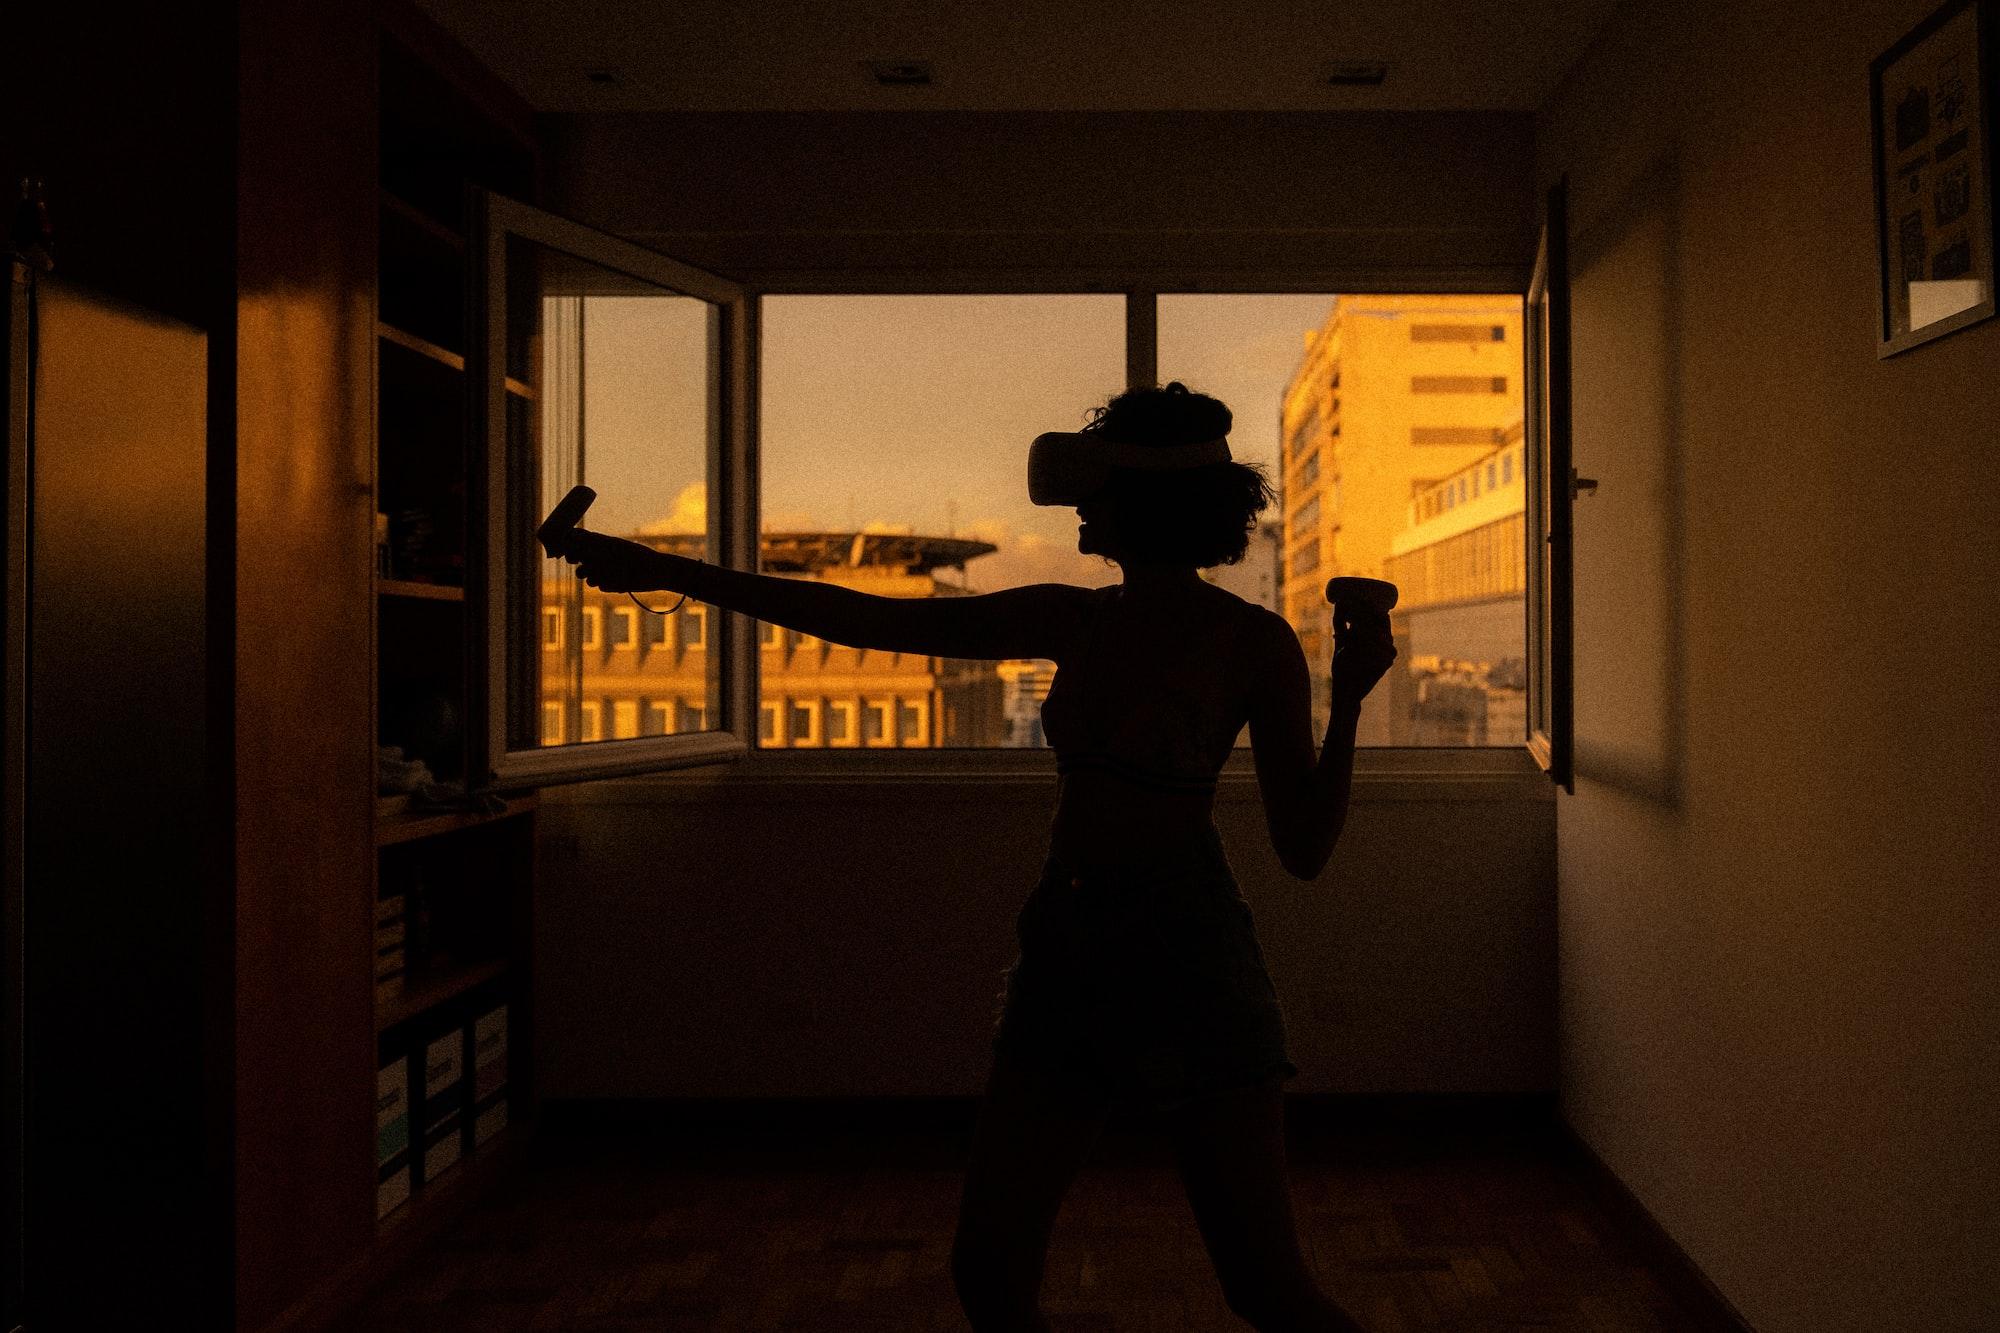 'Eversion': The Real-World Impact of Virtual Self-Organizing Communities